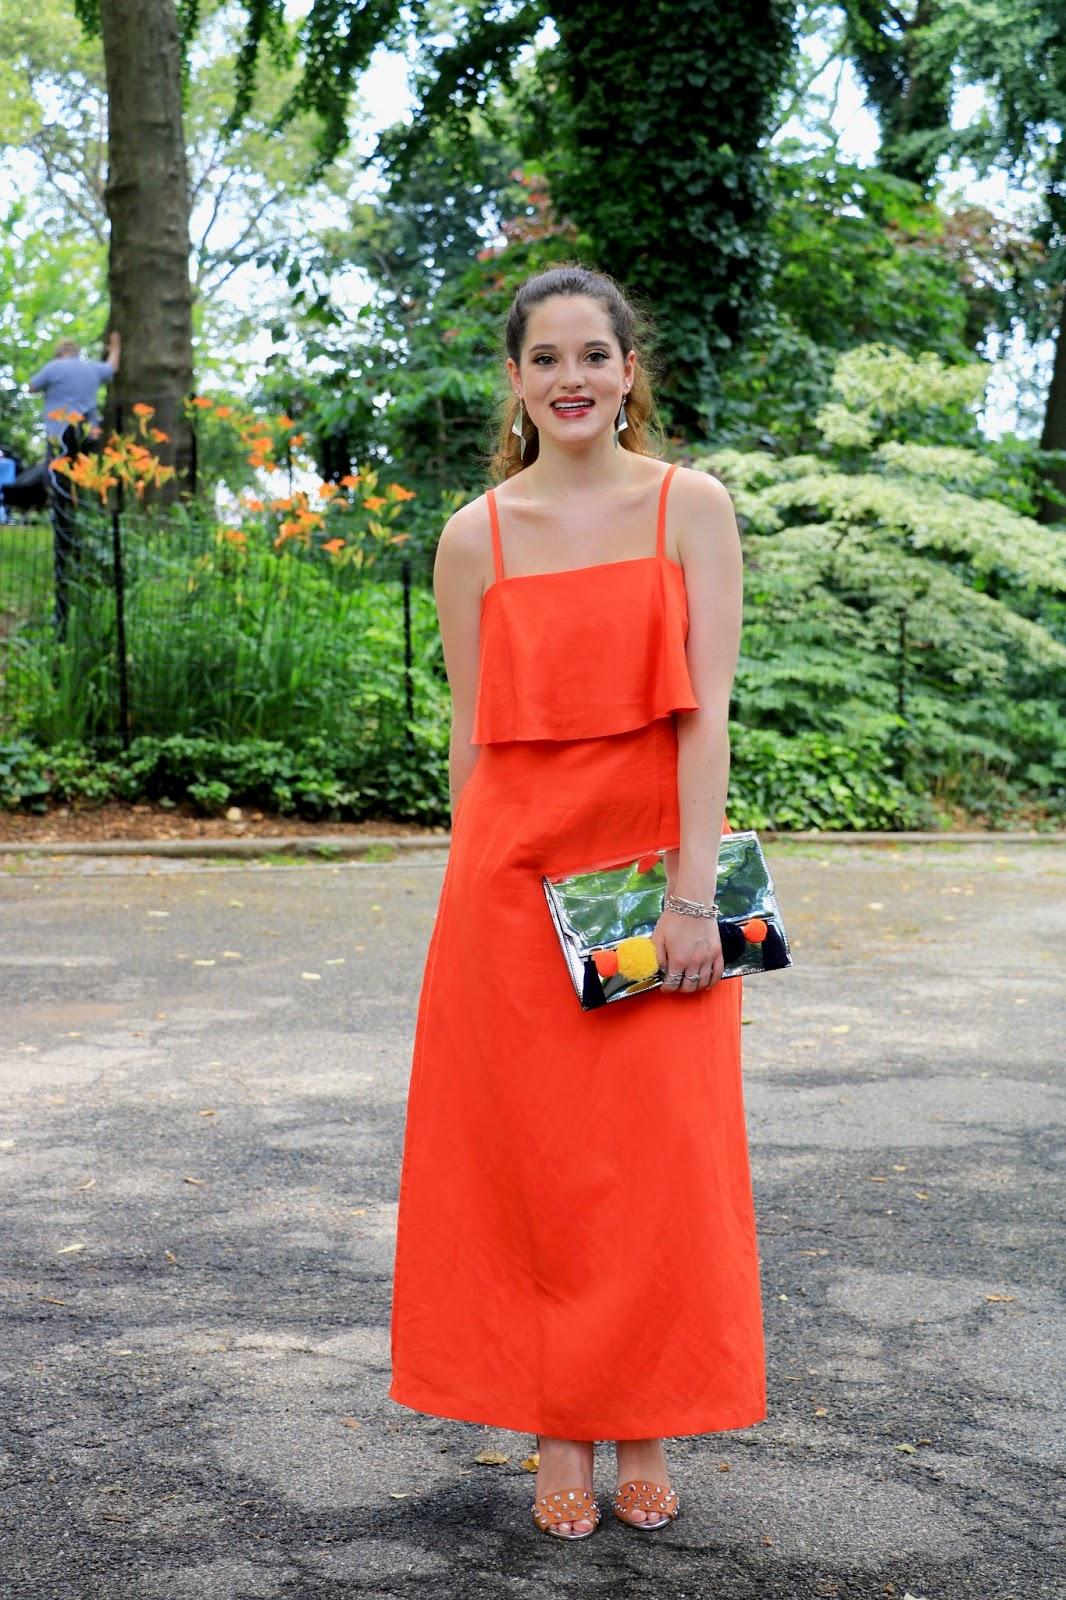 Fashion blogger Kathleen Harper of Kat's Fashion Fix showing summer wedding outfit ideas